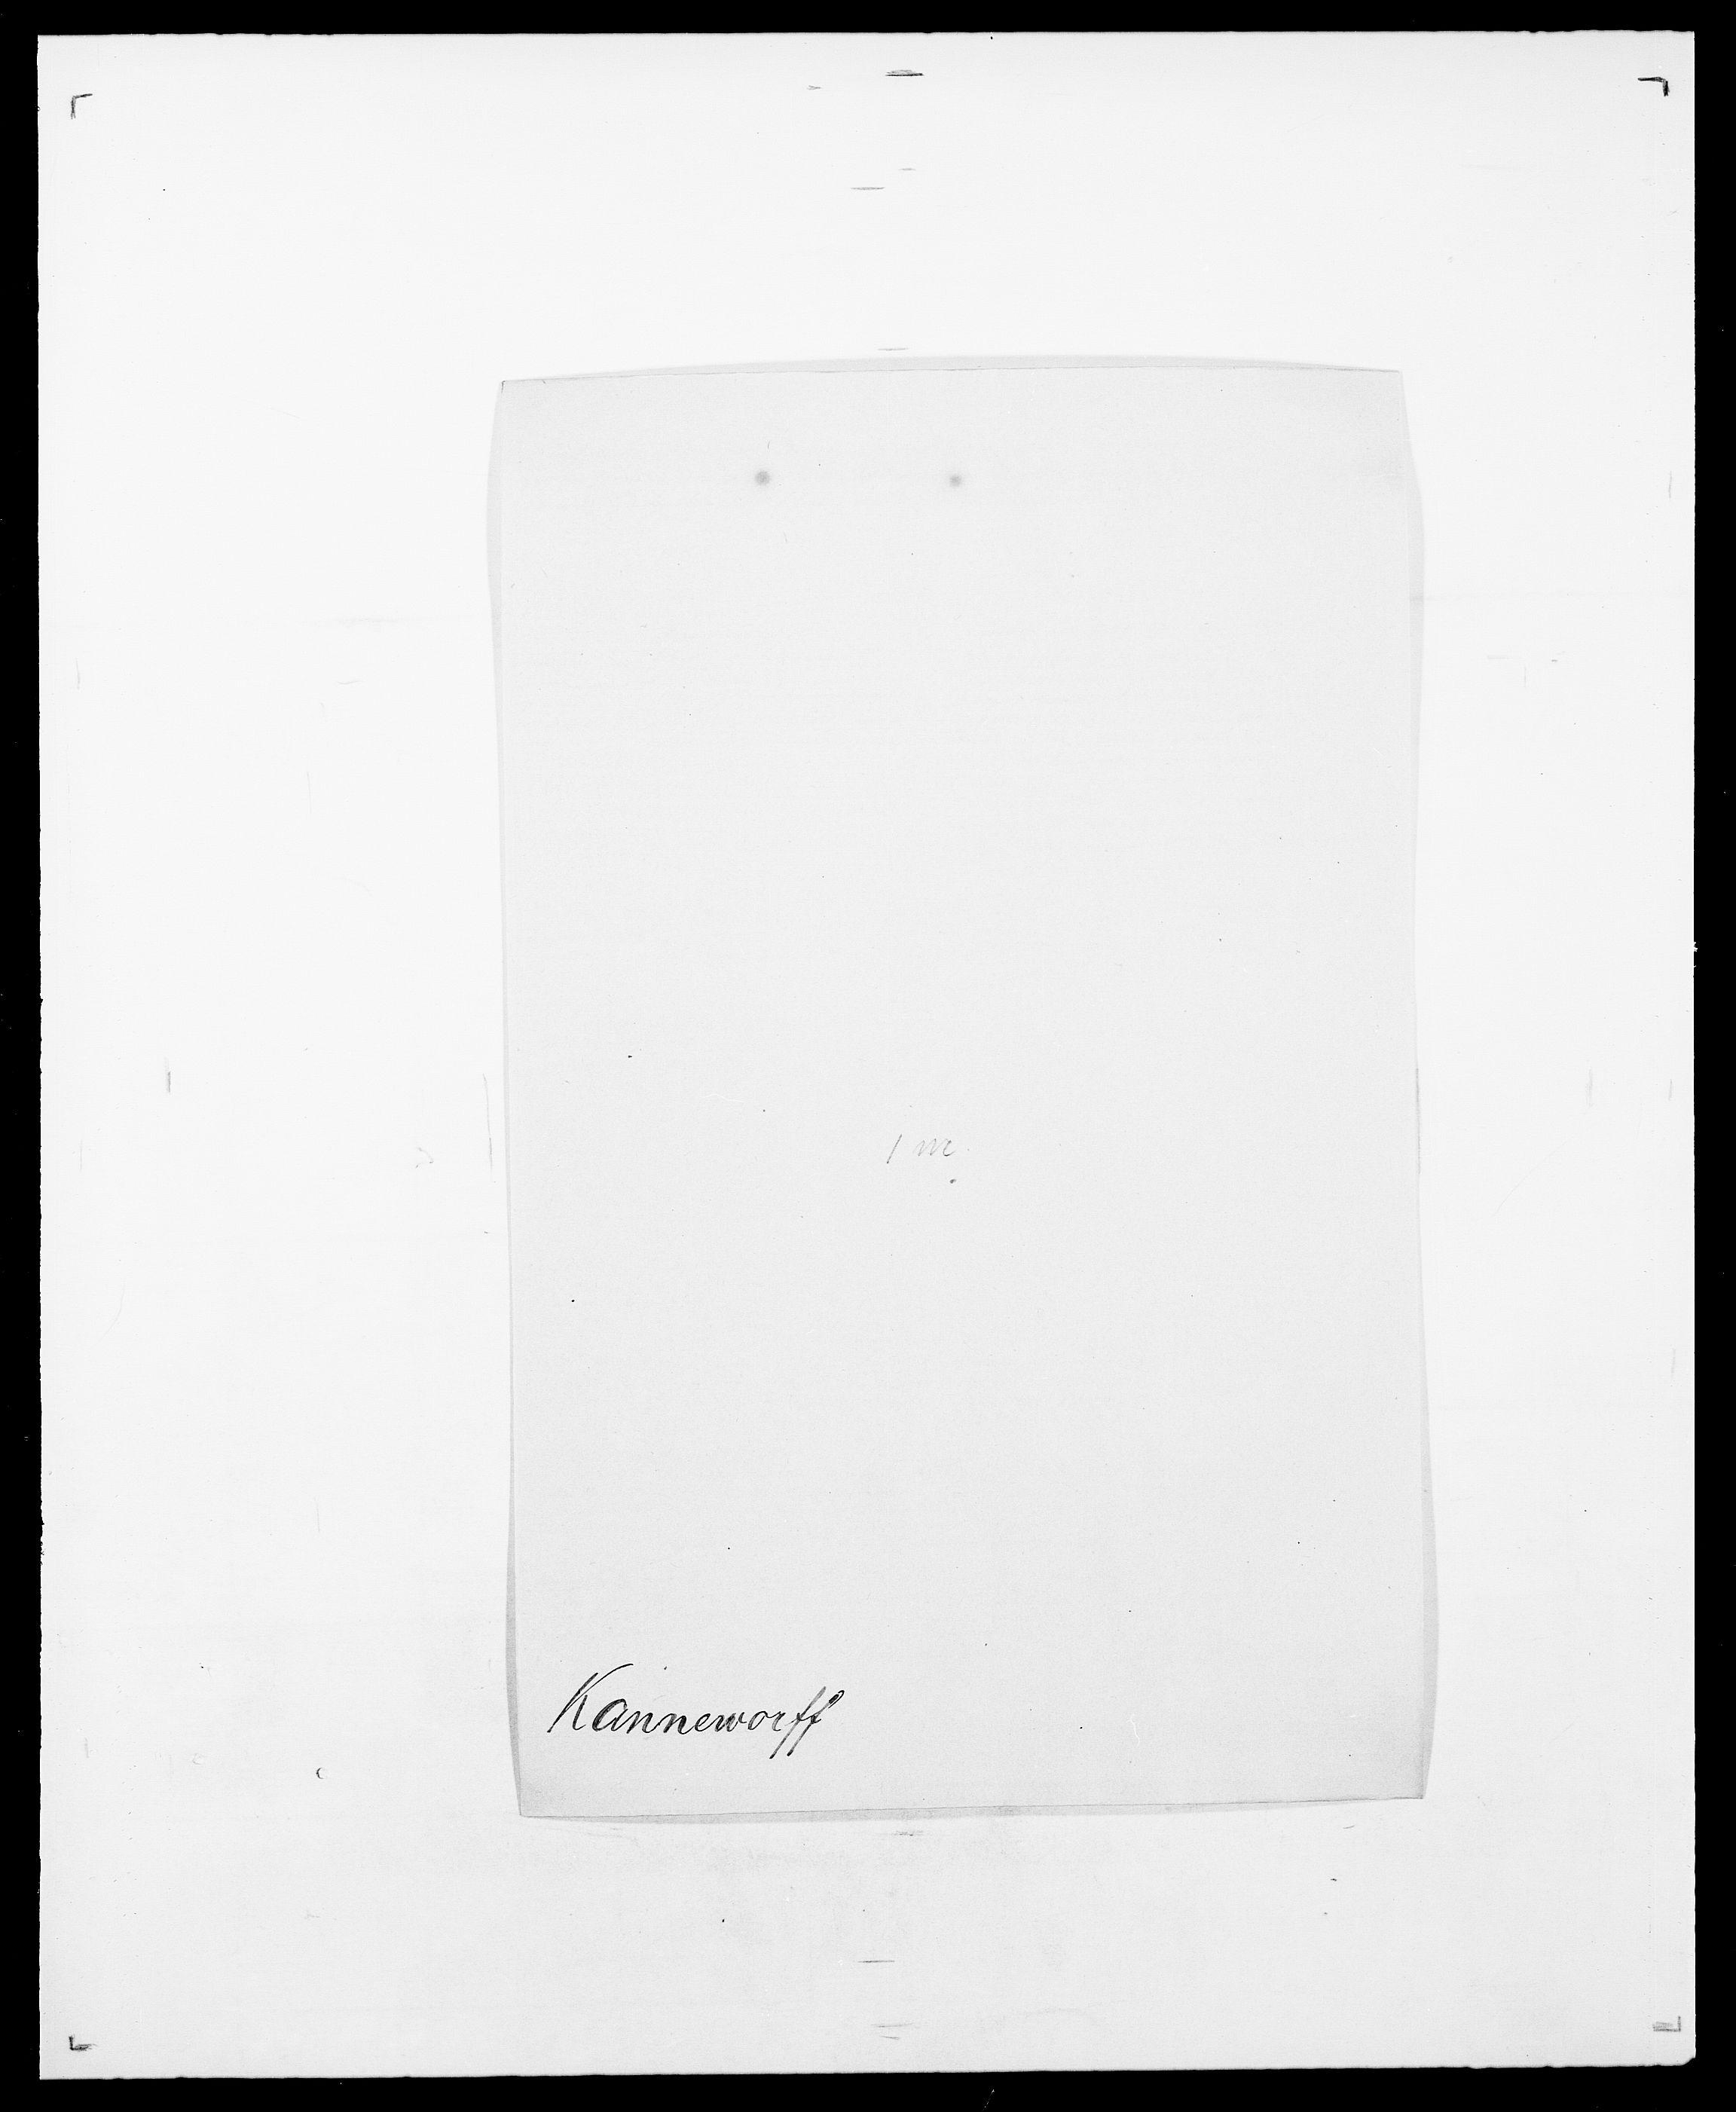 SAO, Delgobe, Charles Antoine - samling, D/Da/L0020: Irgens - Kjøsterud, s. 469